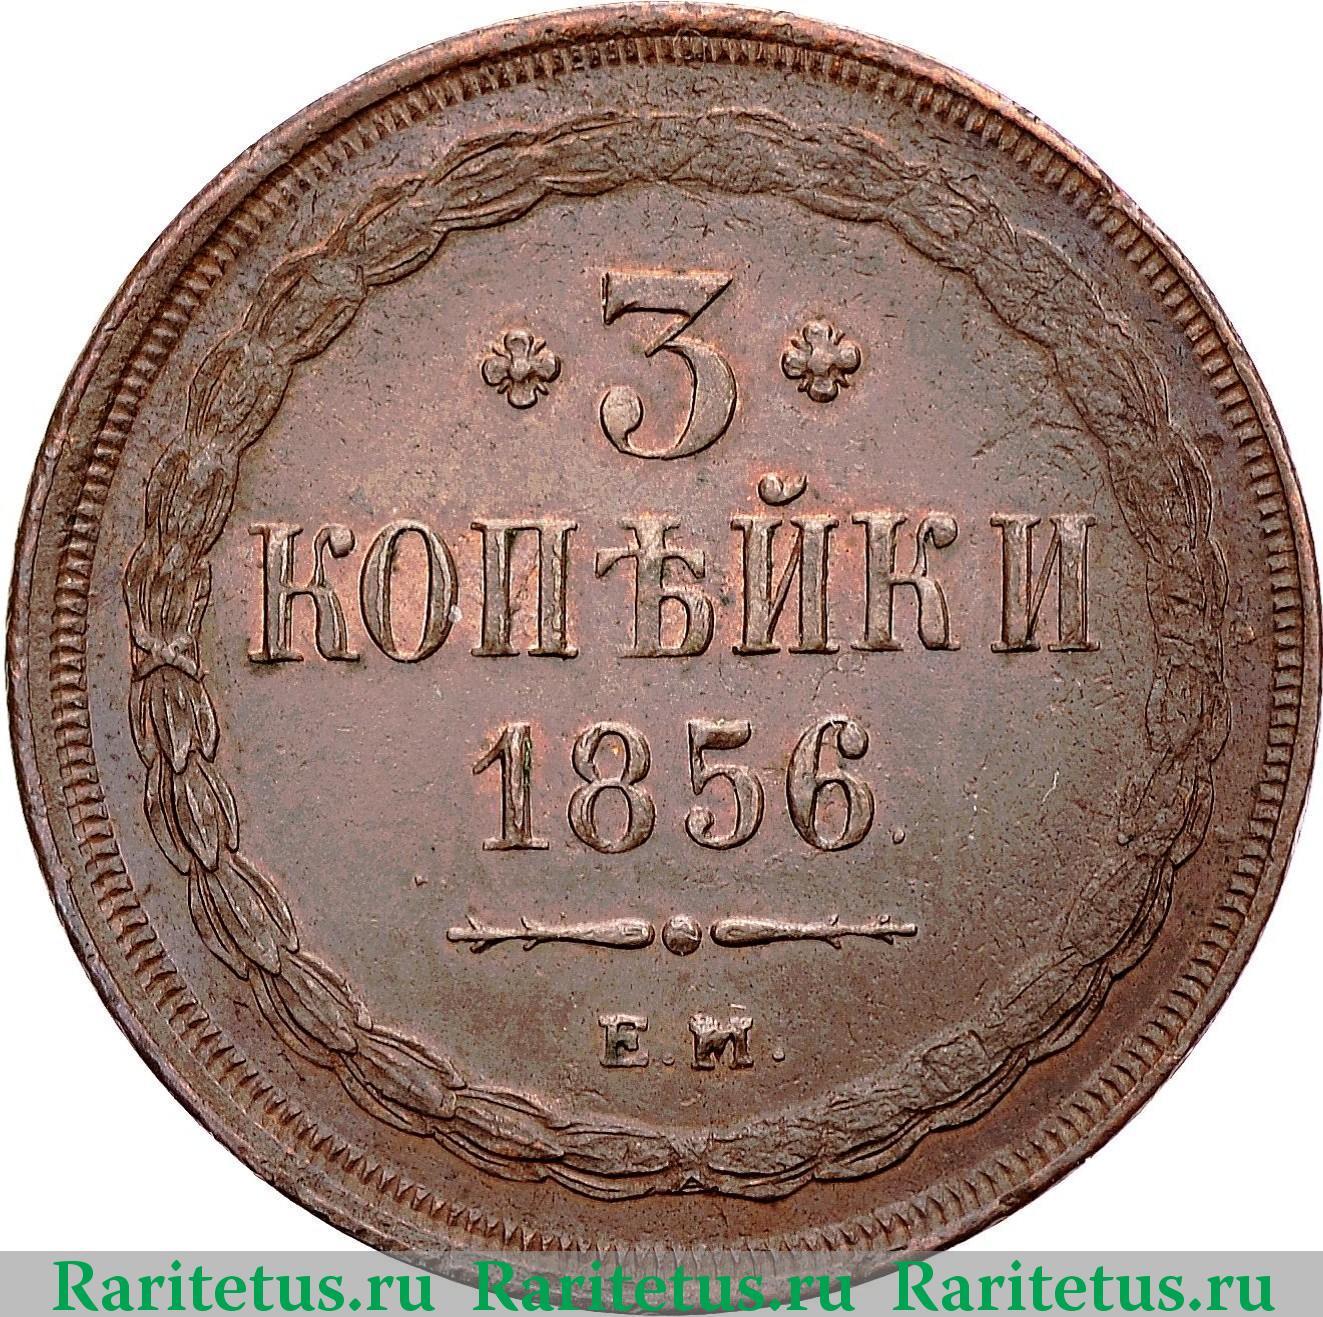 2 копейки 1856 года цена монеты папка